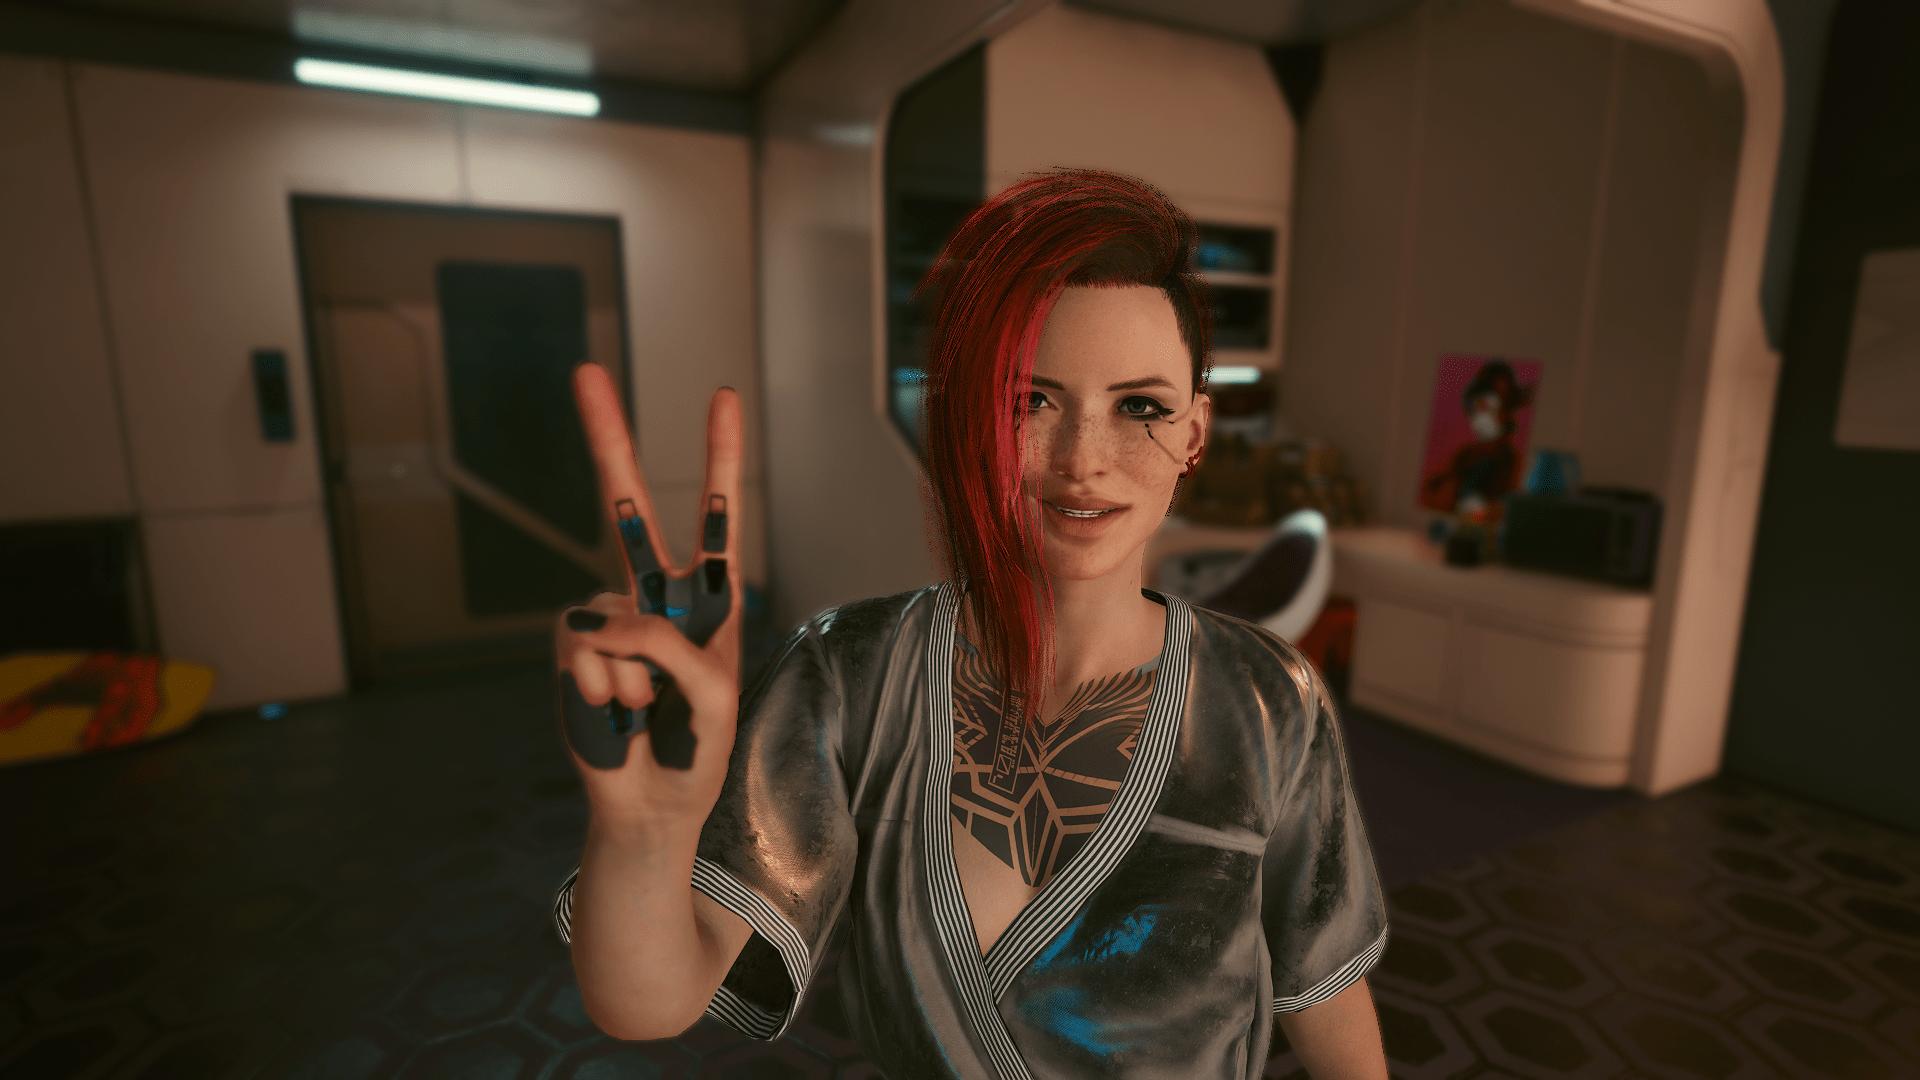 Vs Character Preset by Jade - Cyberpunk 2077 Mod